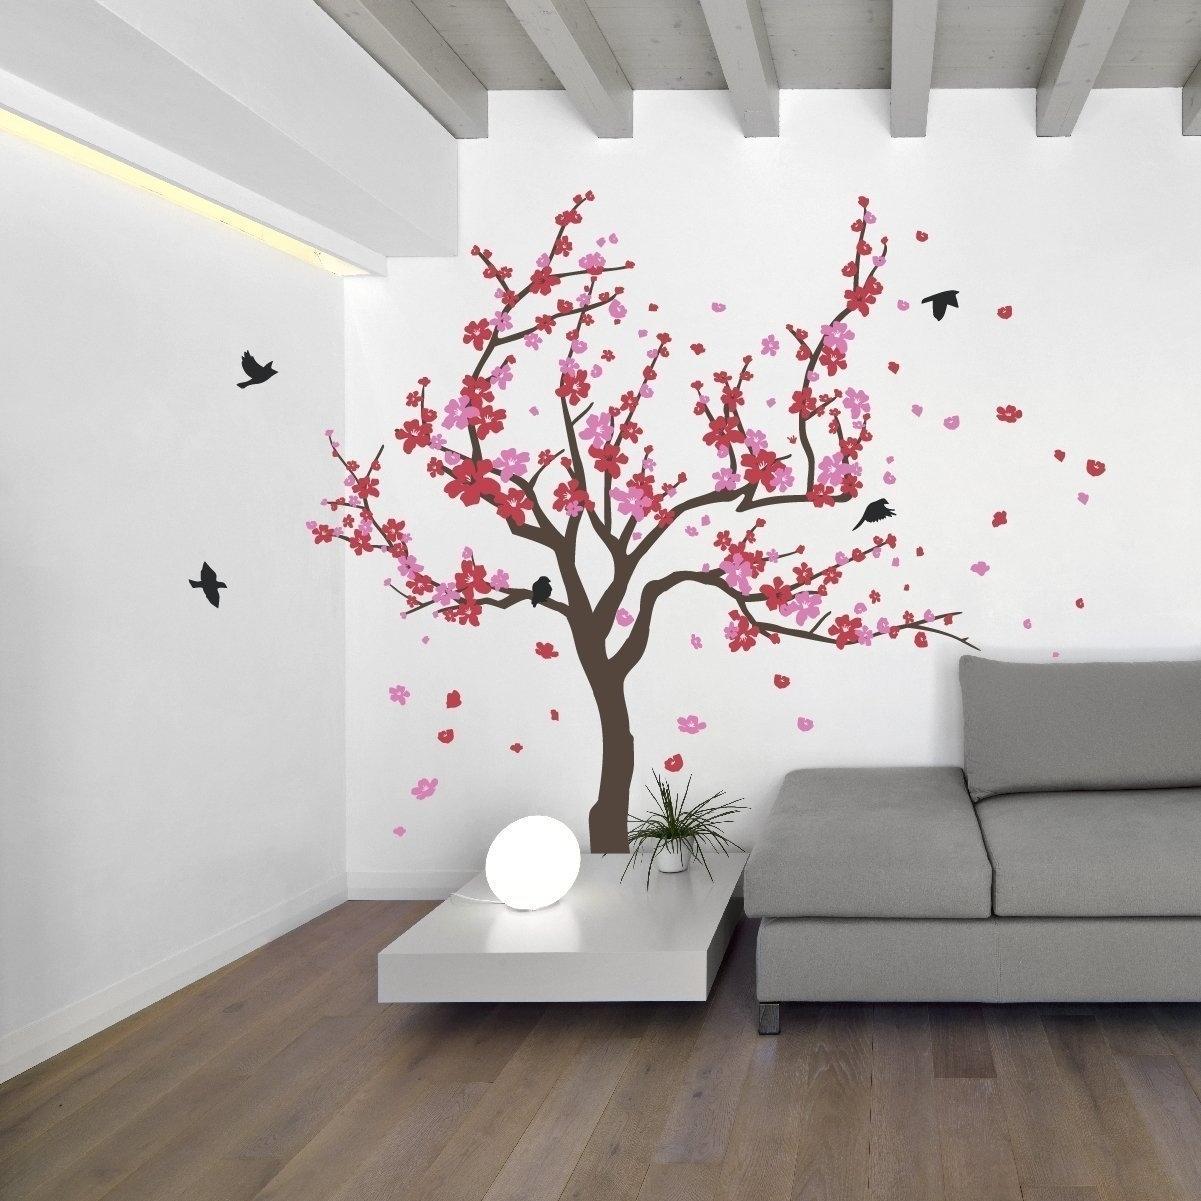 Cherry Blossom Wall Art Inside Most Recent Cherry Blossom Wall Art – Amthuchanoi (View 3 of 15)